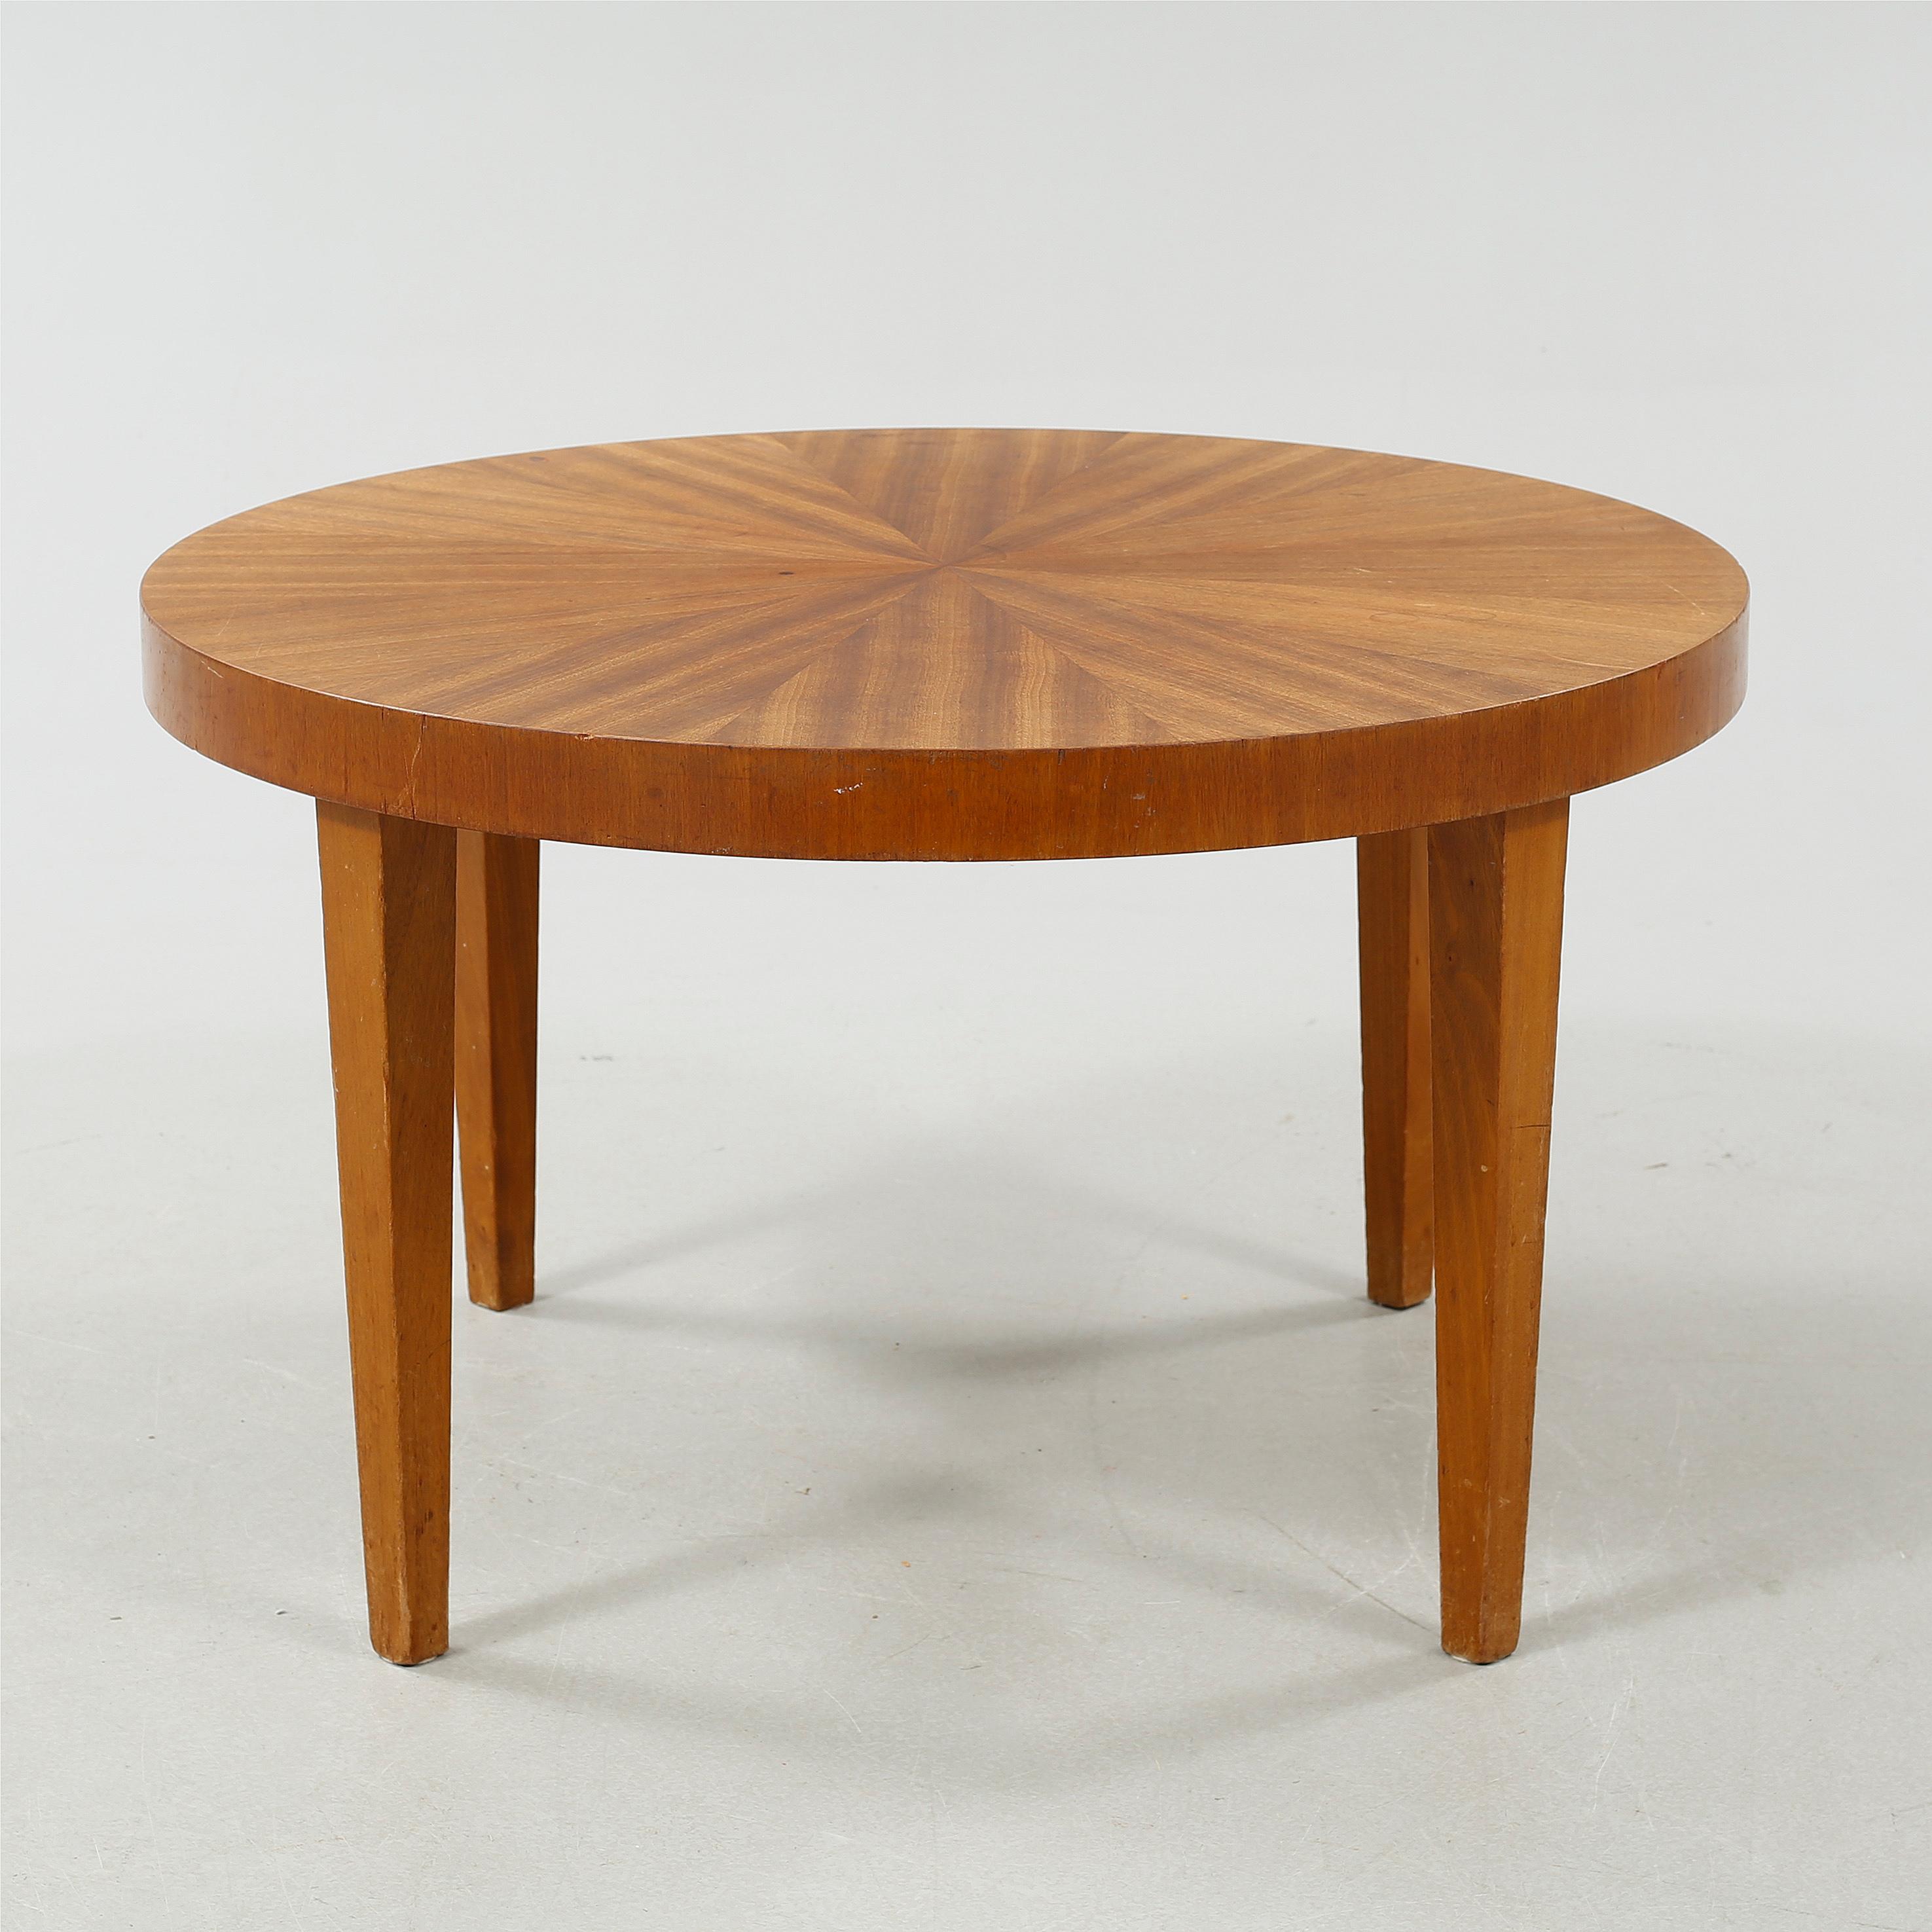 A 1930s coffee table by Nordiska Kompaniet Bukowskis